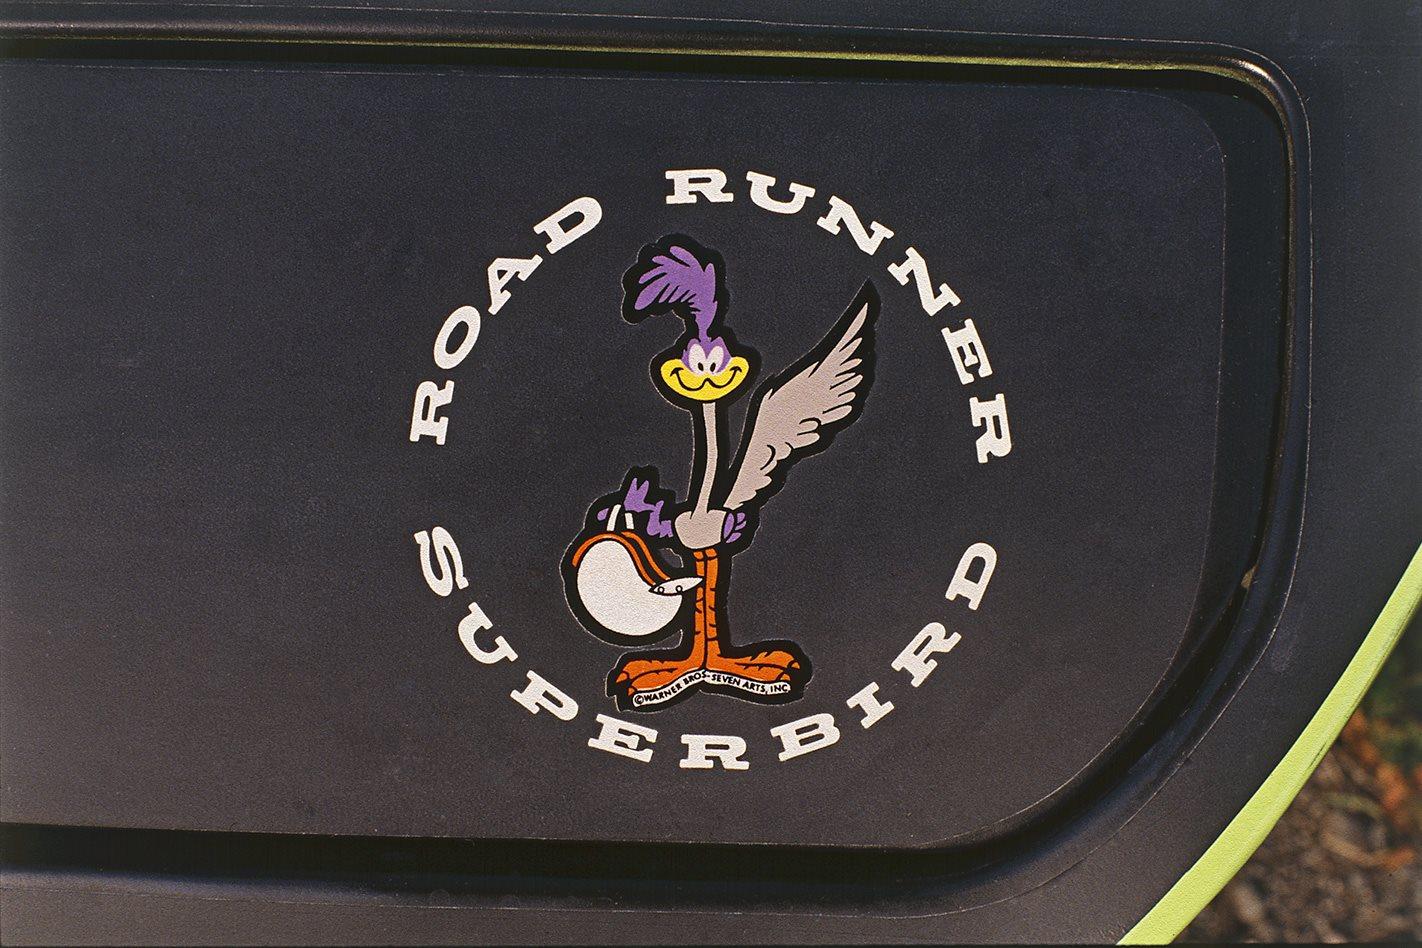 1970 Plymouth Superbird roadrunner